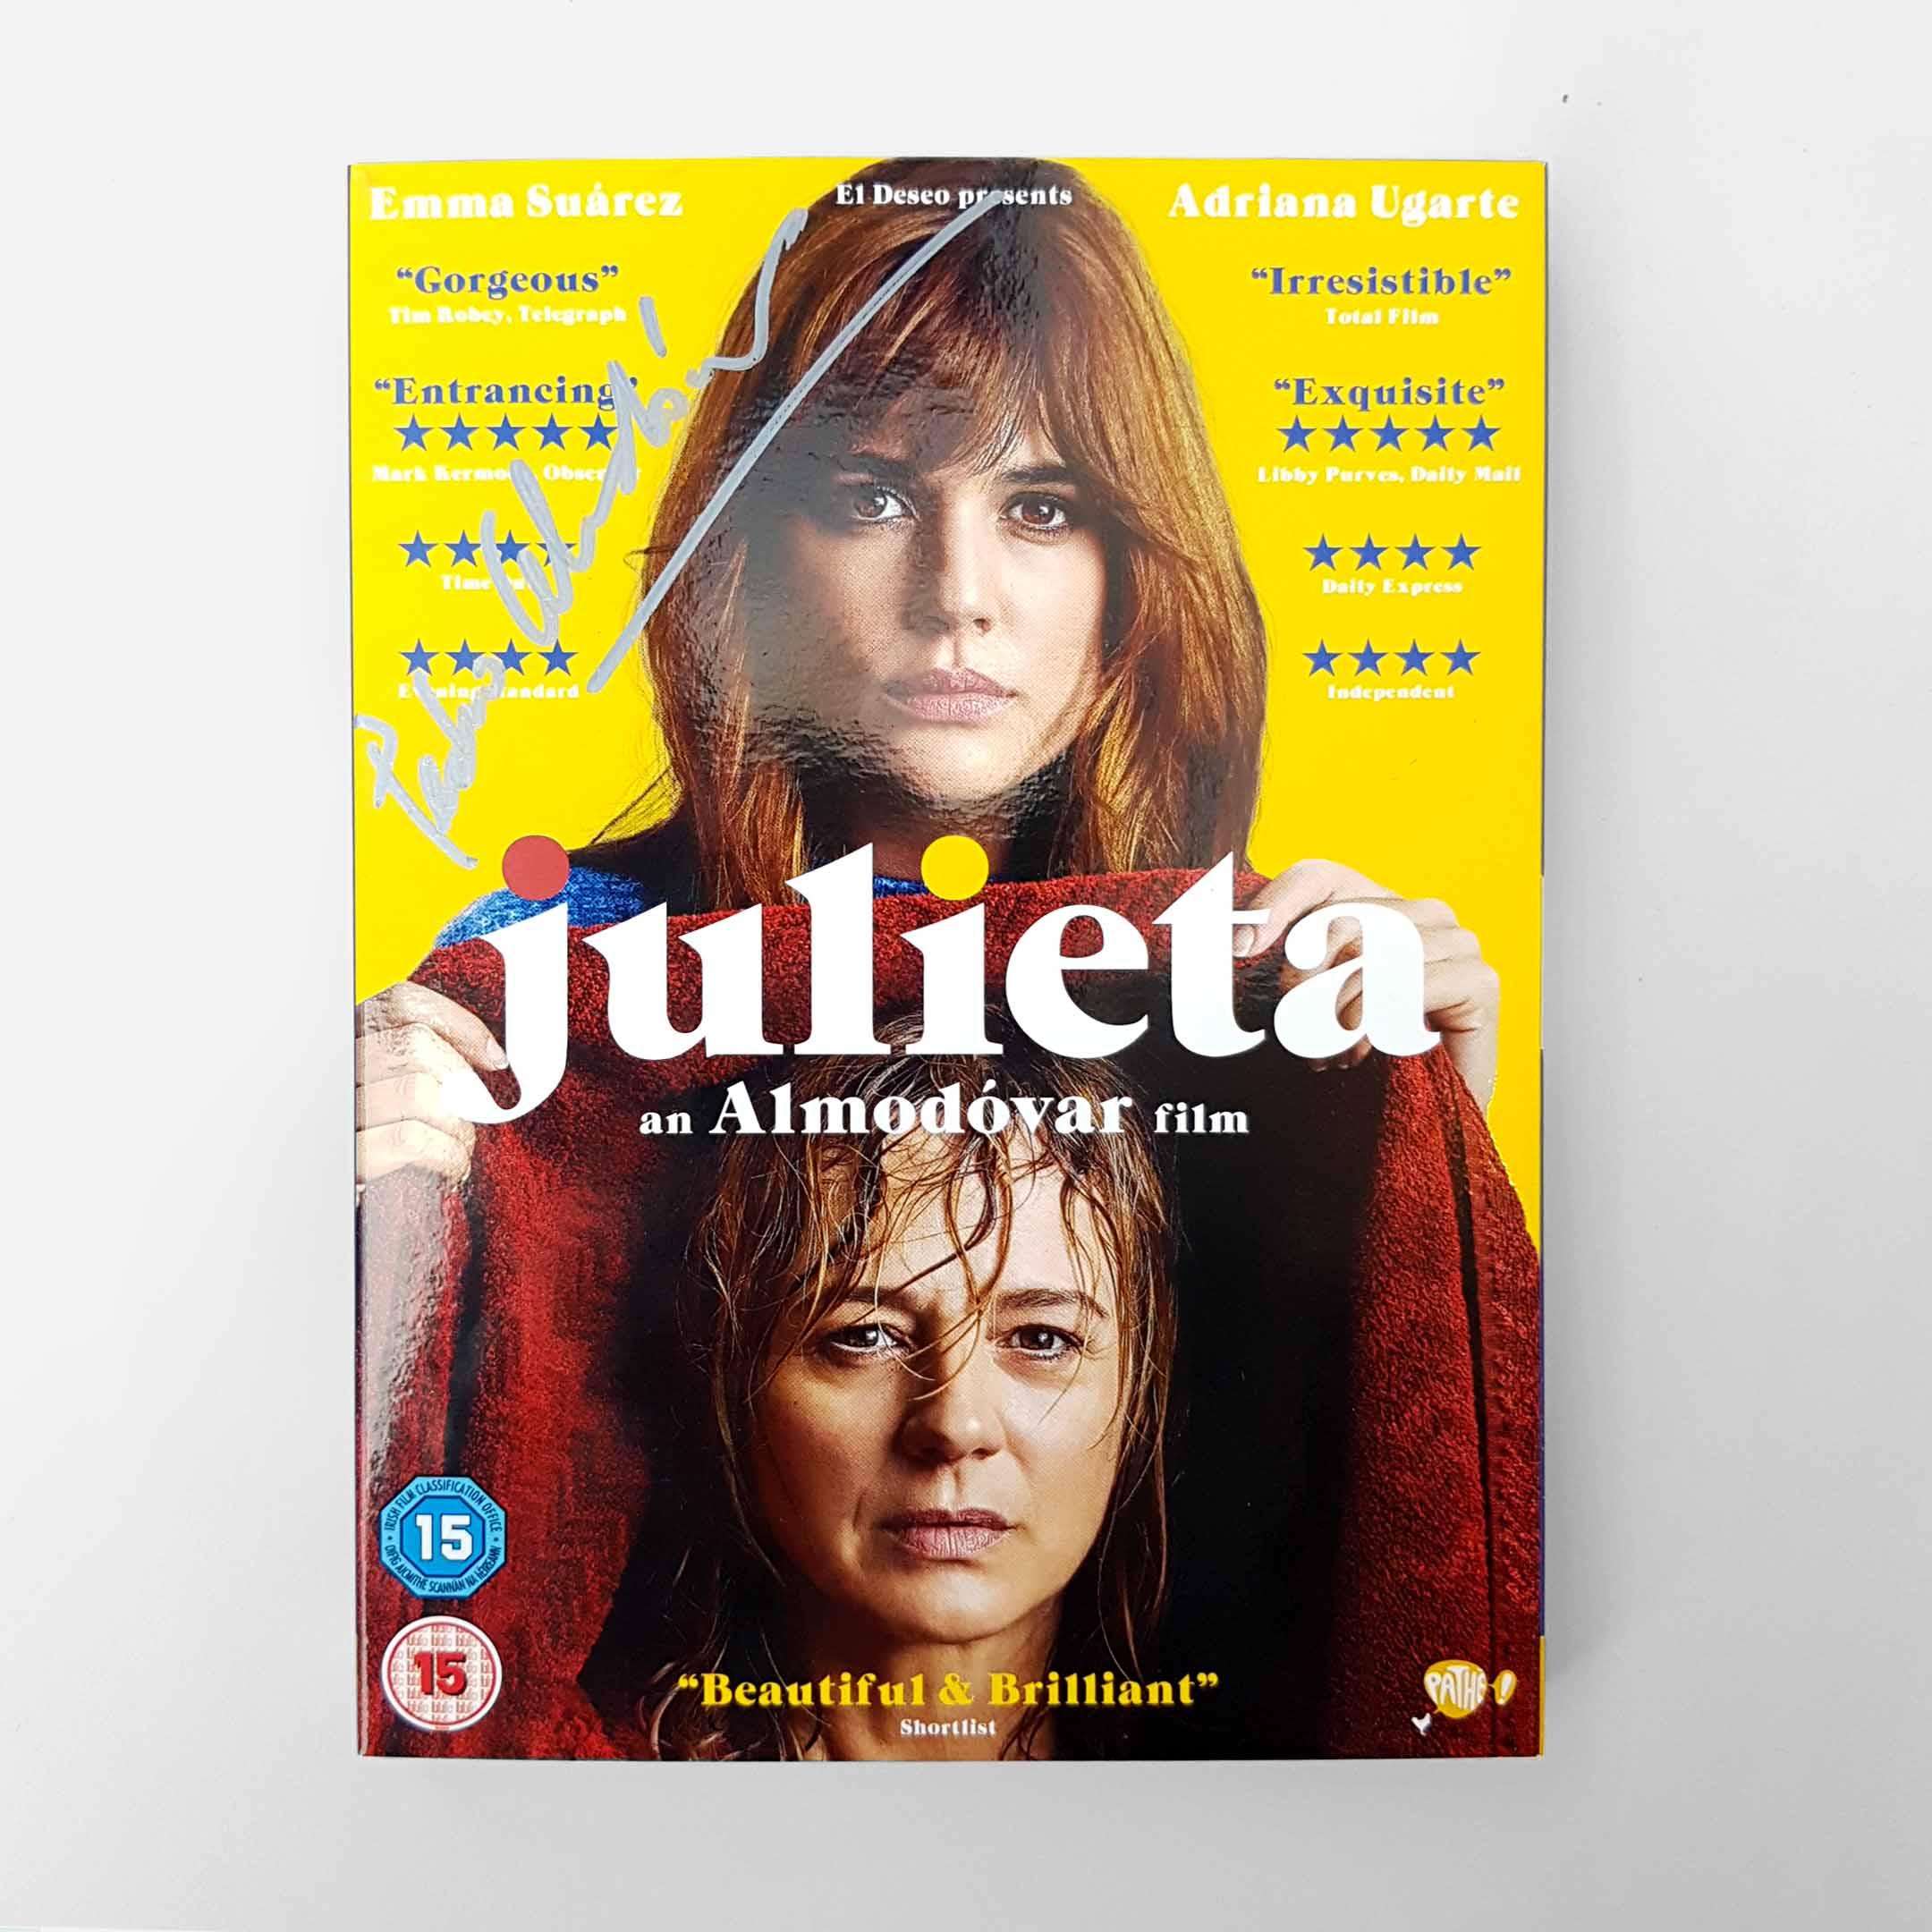 Buy Julieta SIGNED BY PEDRO ALMODOVAR